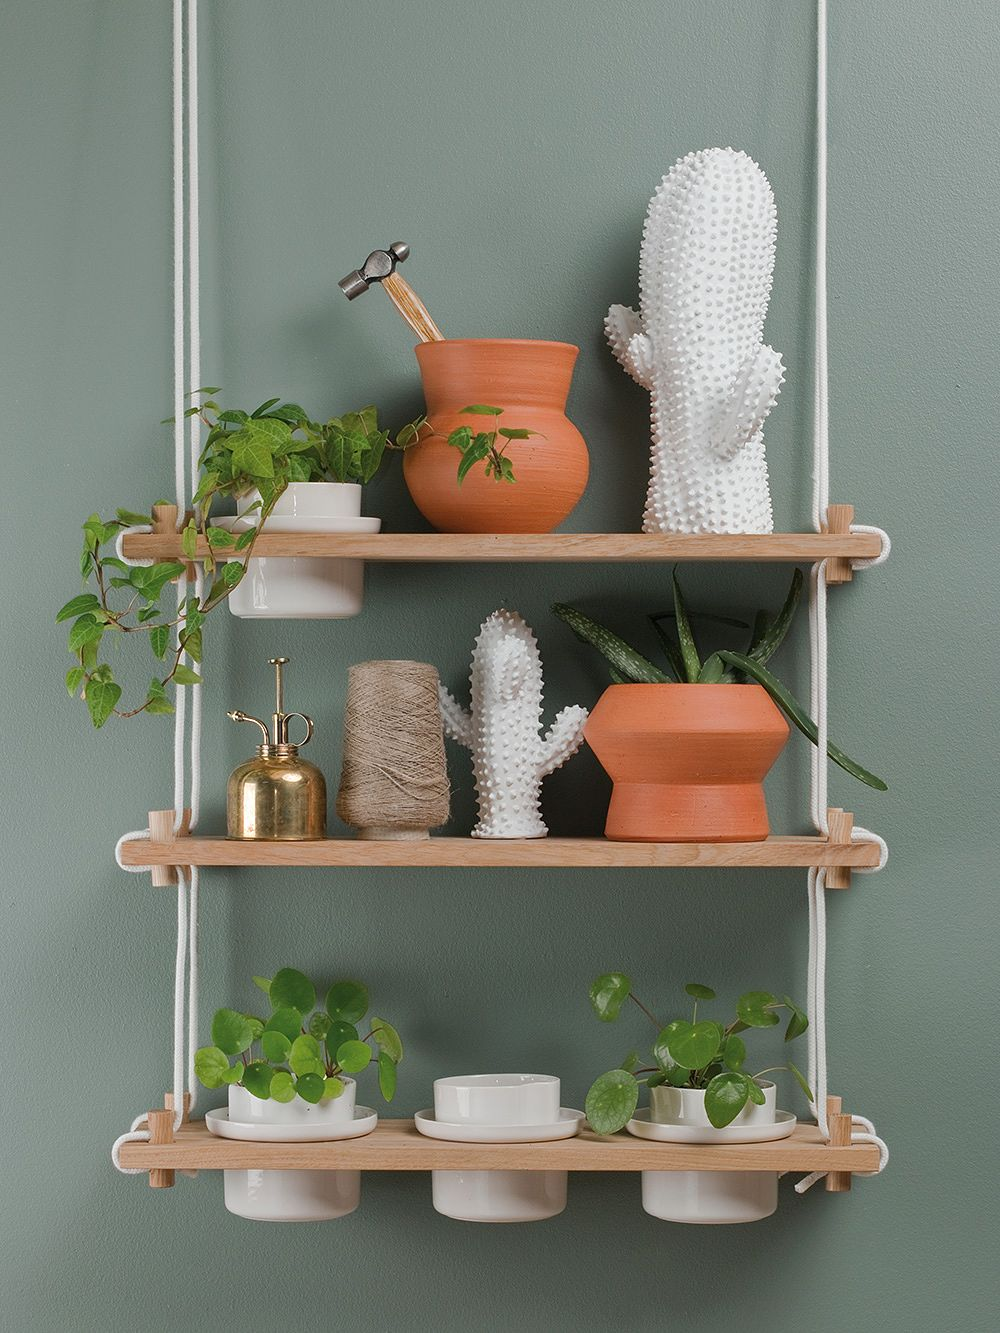 Hakola Riippu Garden shelf